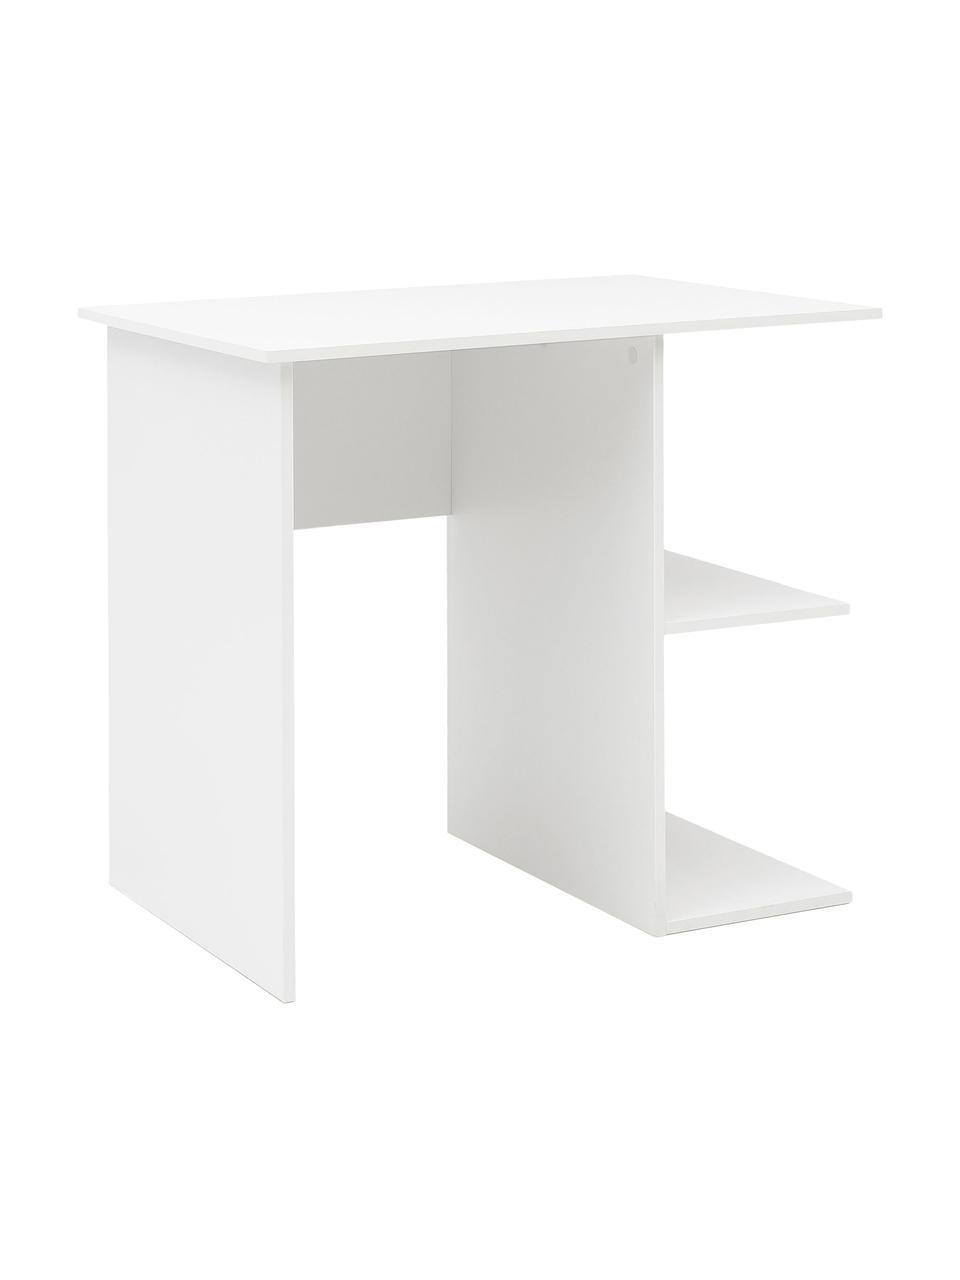 Kleine tafel Milo in mat wit, Melamine gecoate spaanplaat, Wit, 82 x 76 cm